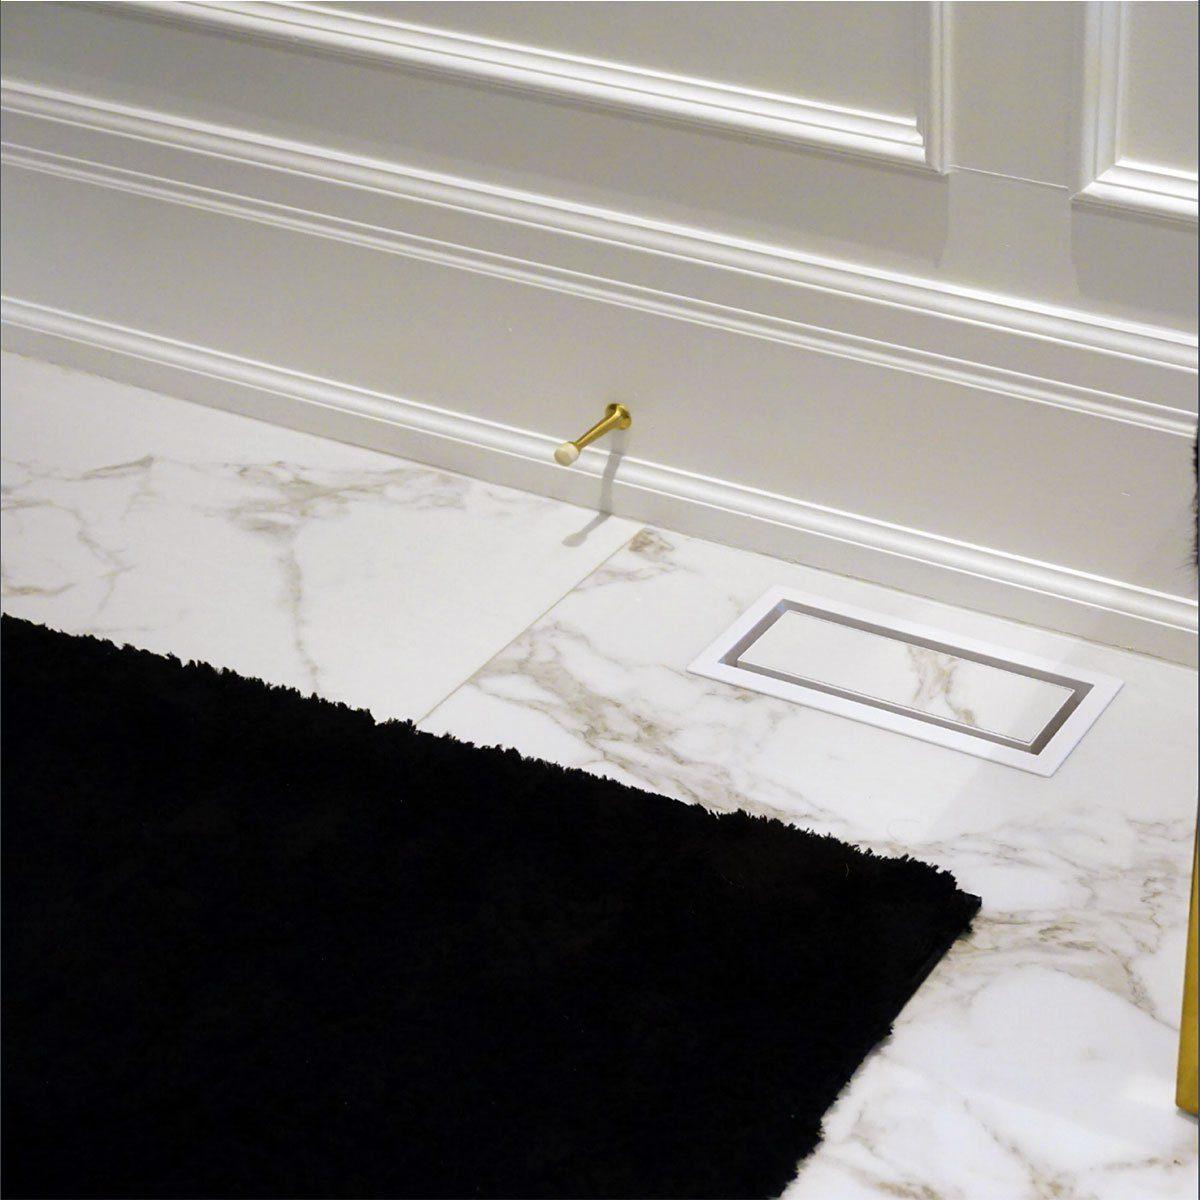 Aria hidden low-profile floor vents | Construction Pro Tips